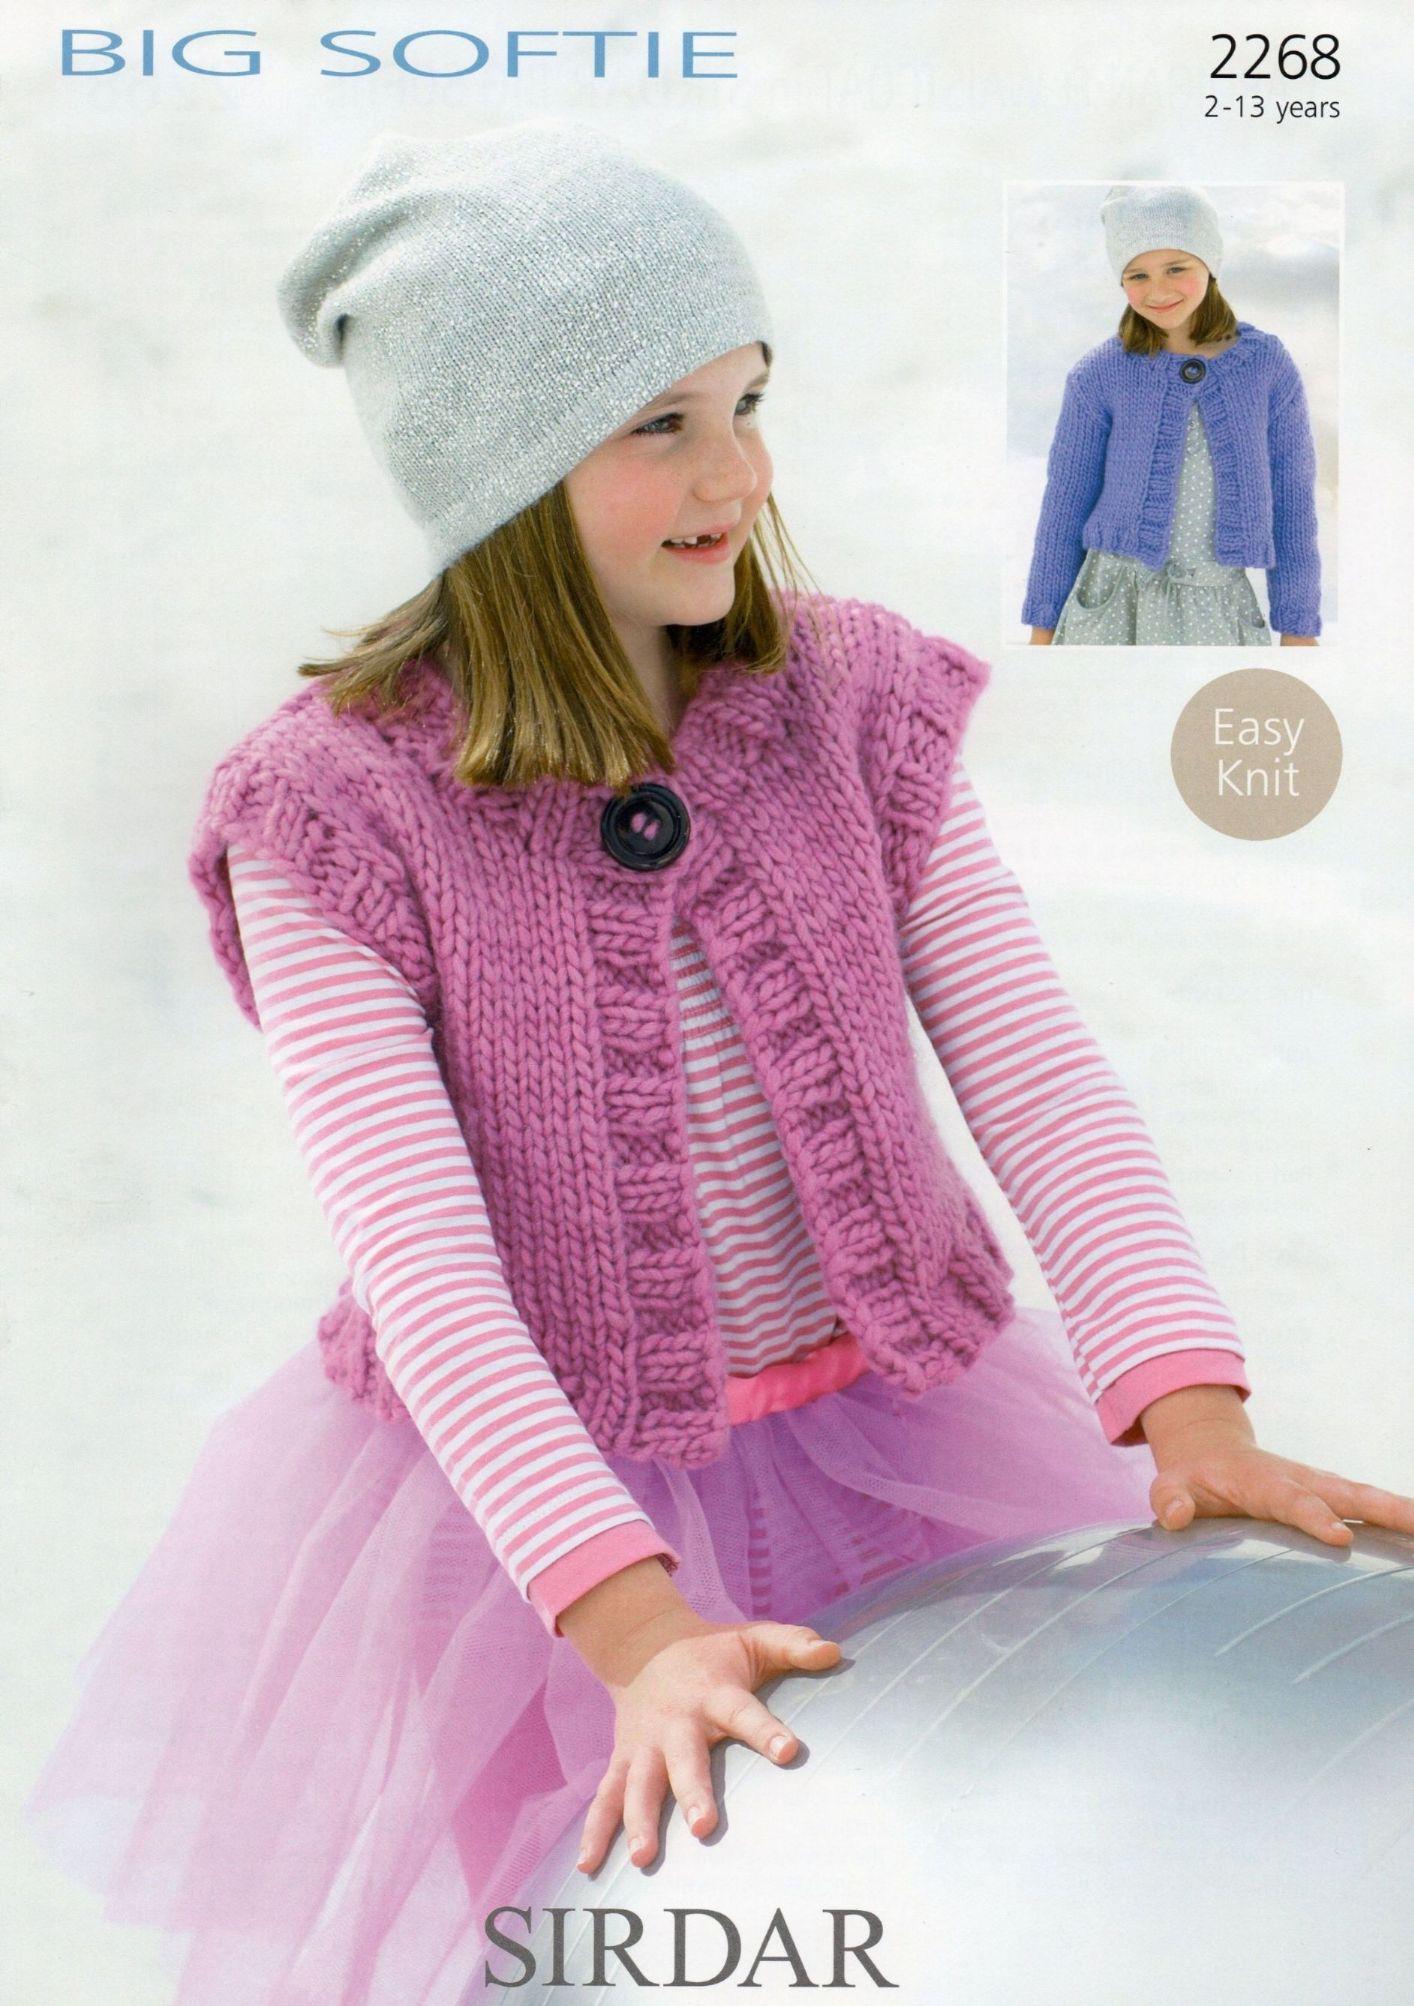 Sirdar Big Softie Knitting Patterns : 2268 - SIRDAR BIG SOFTIE DENIM ULTRA CARDIGAN & WAISTCOAT KNITTING PATTER...